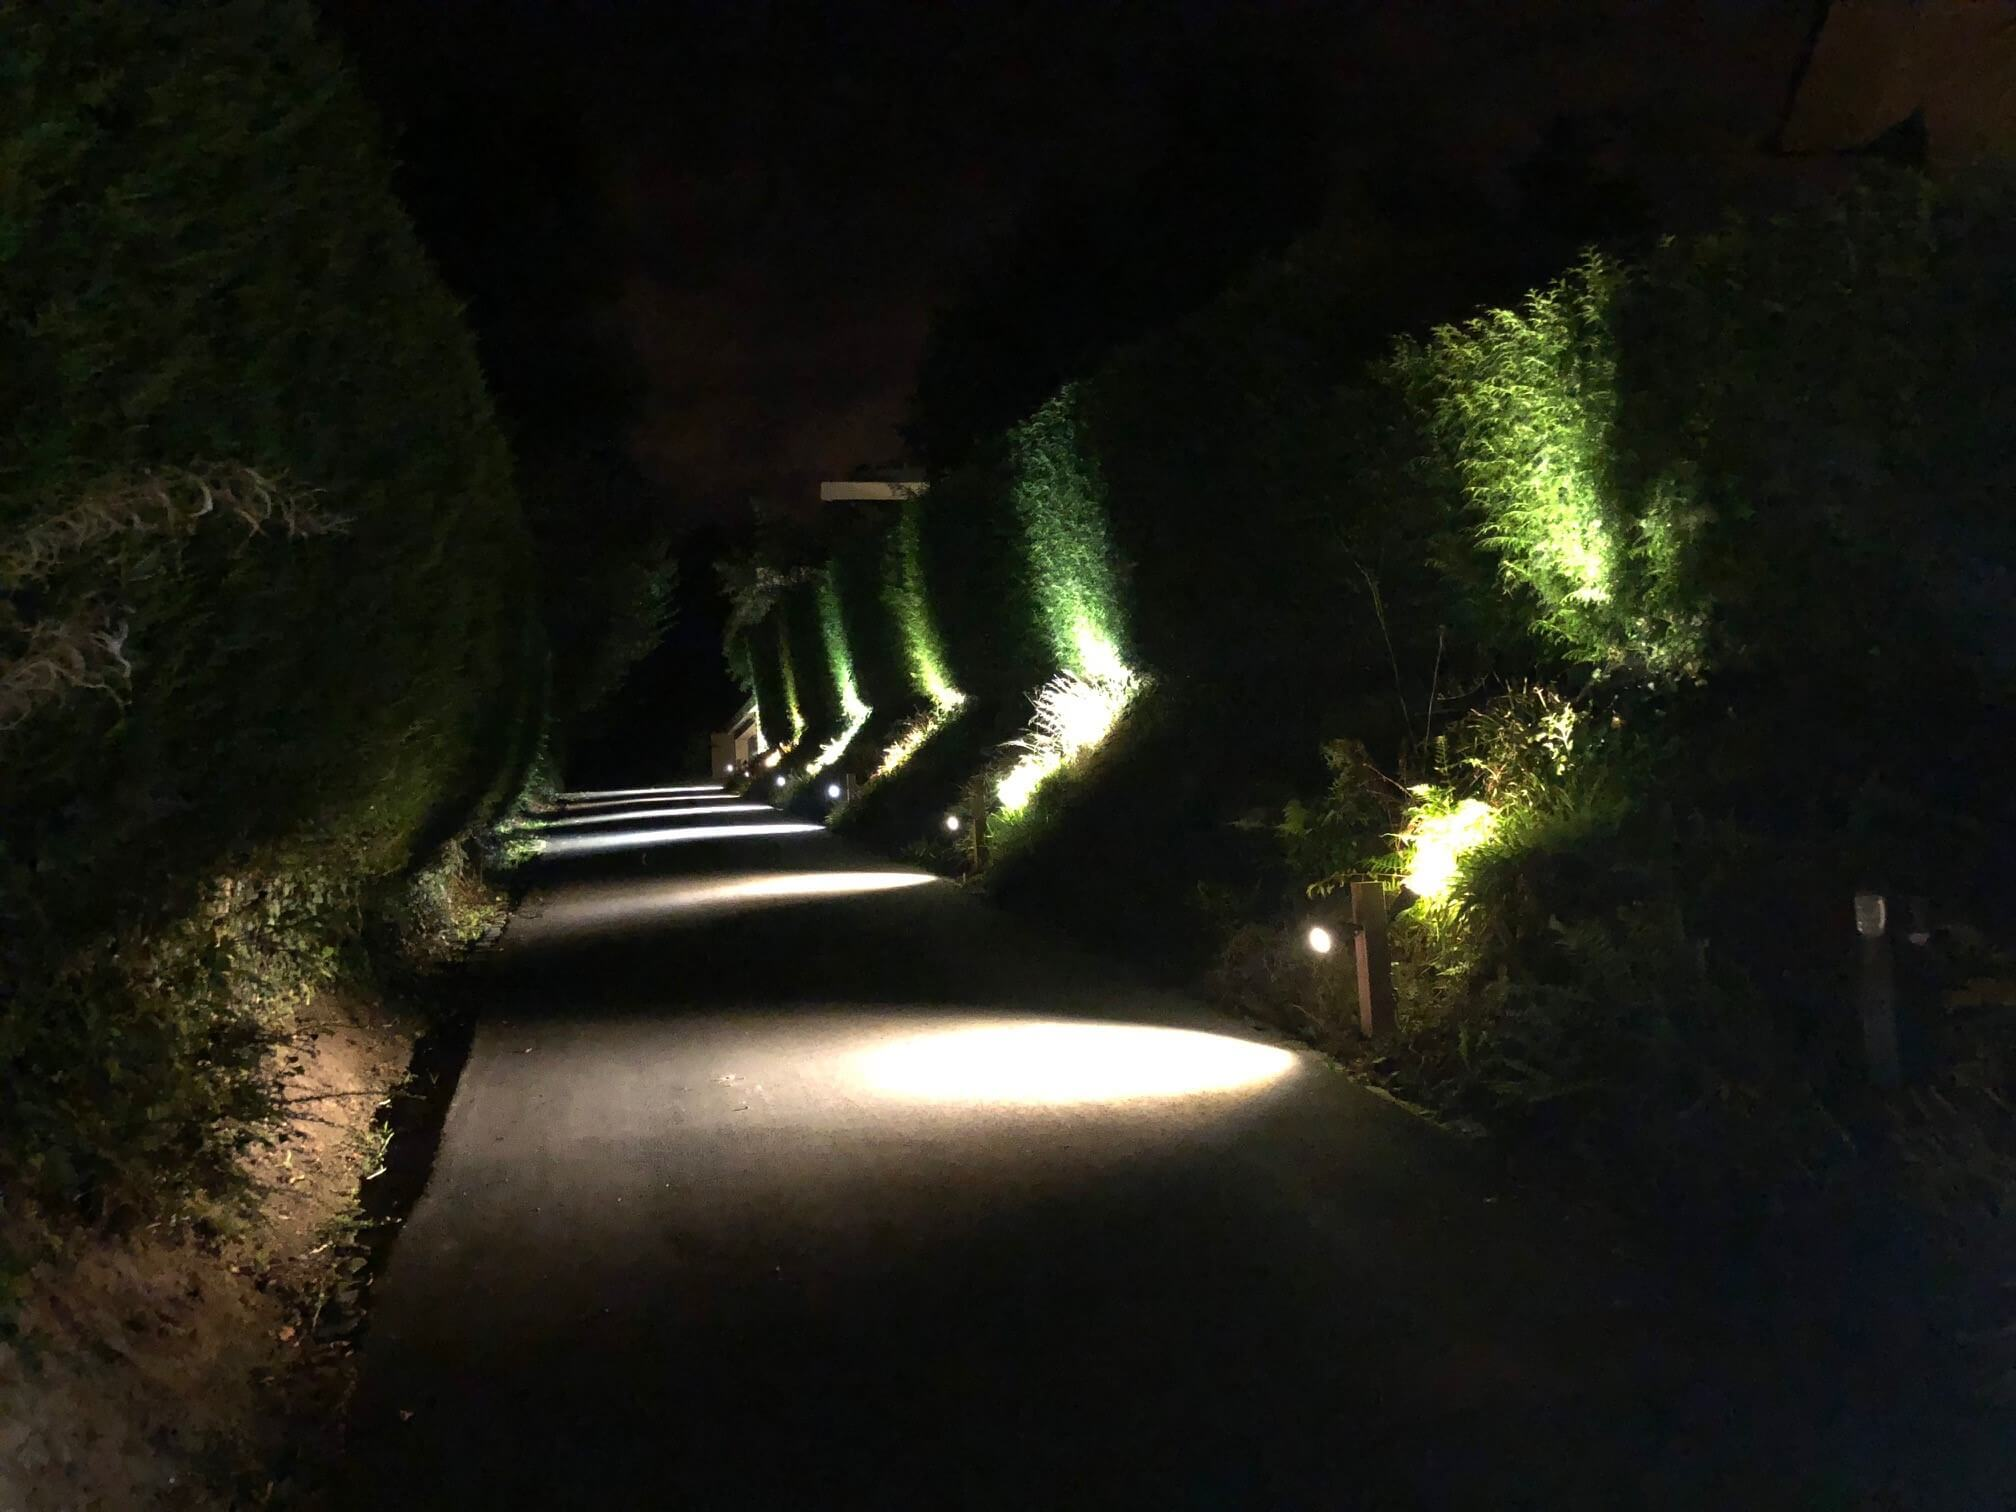 night-elec-galerie-electricite-vanhoyesprl